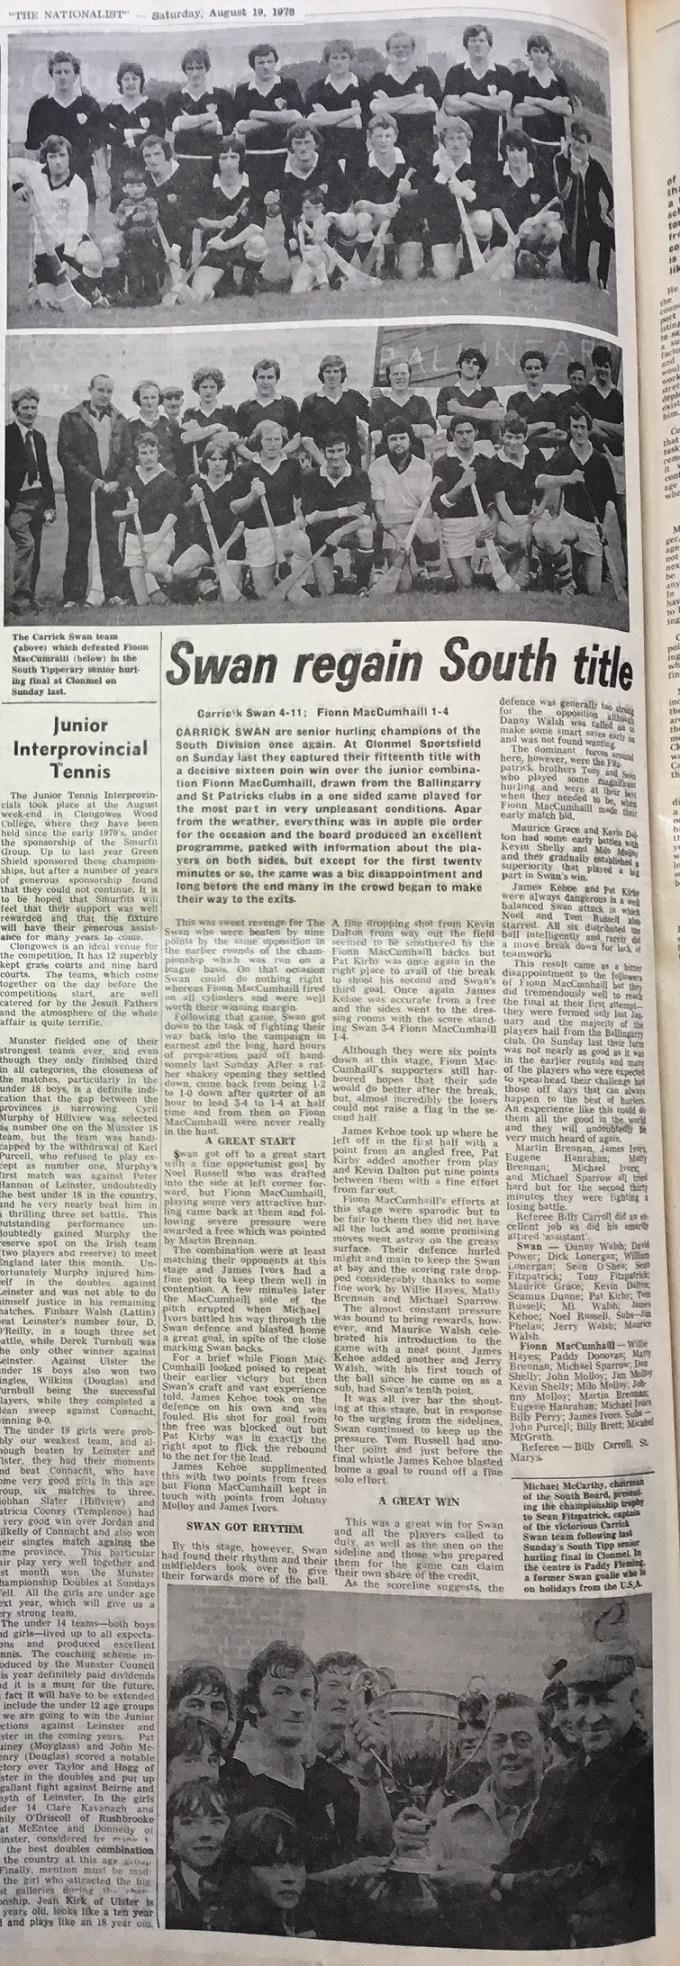 1978 South hurling final